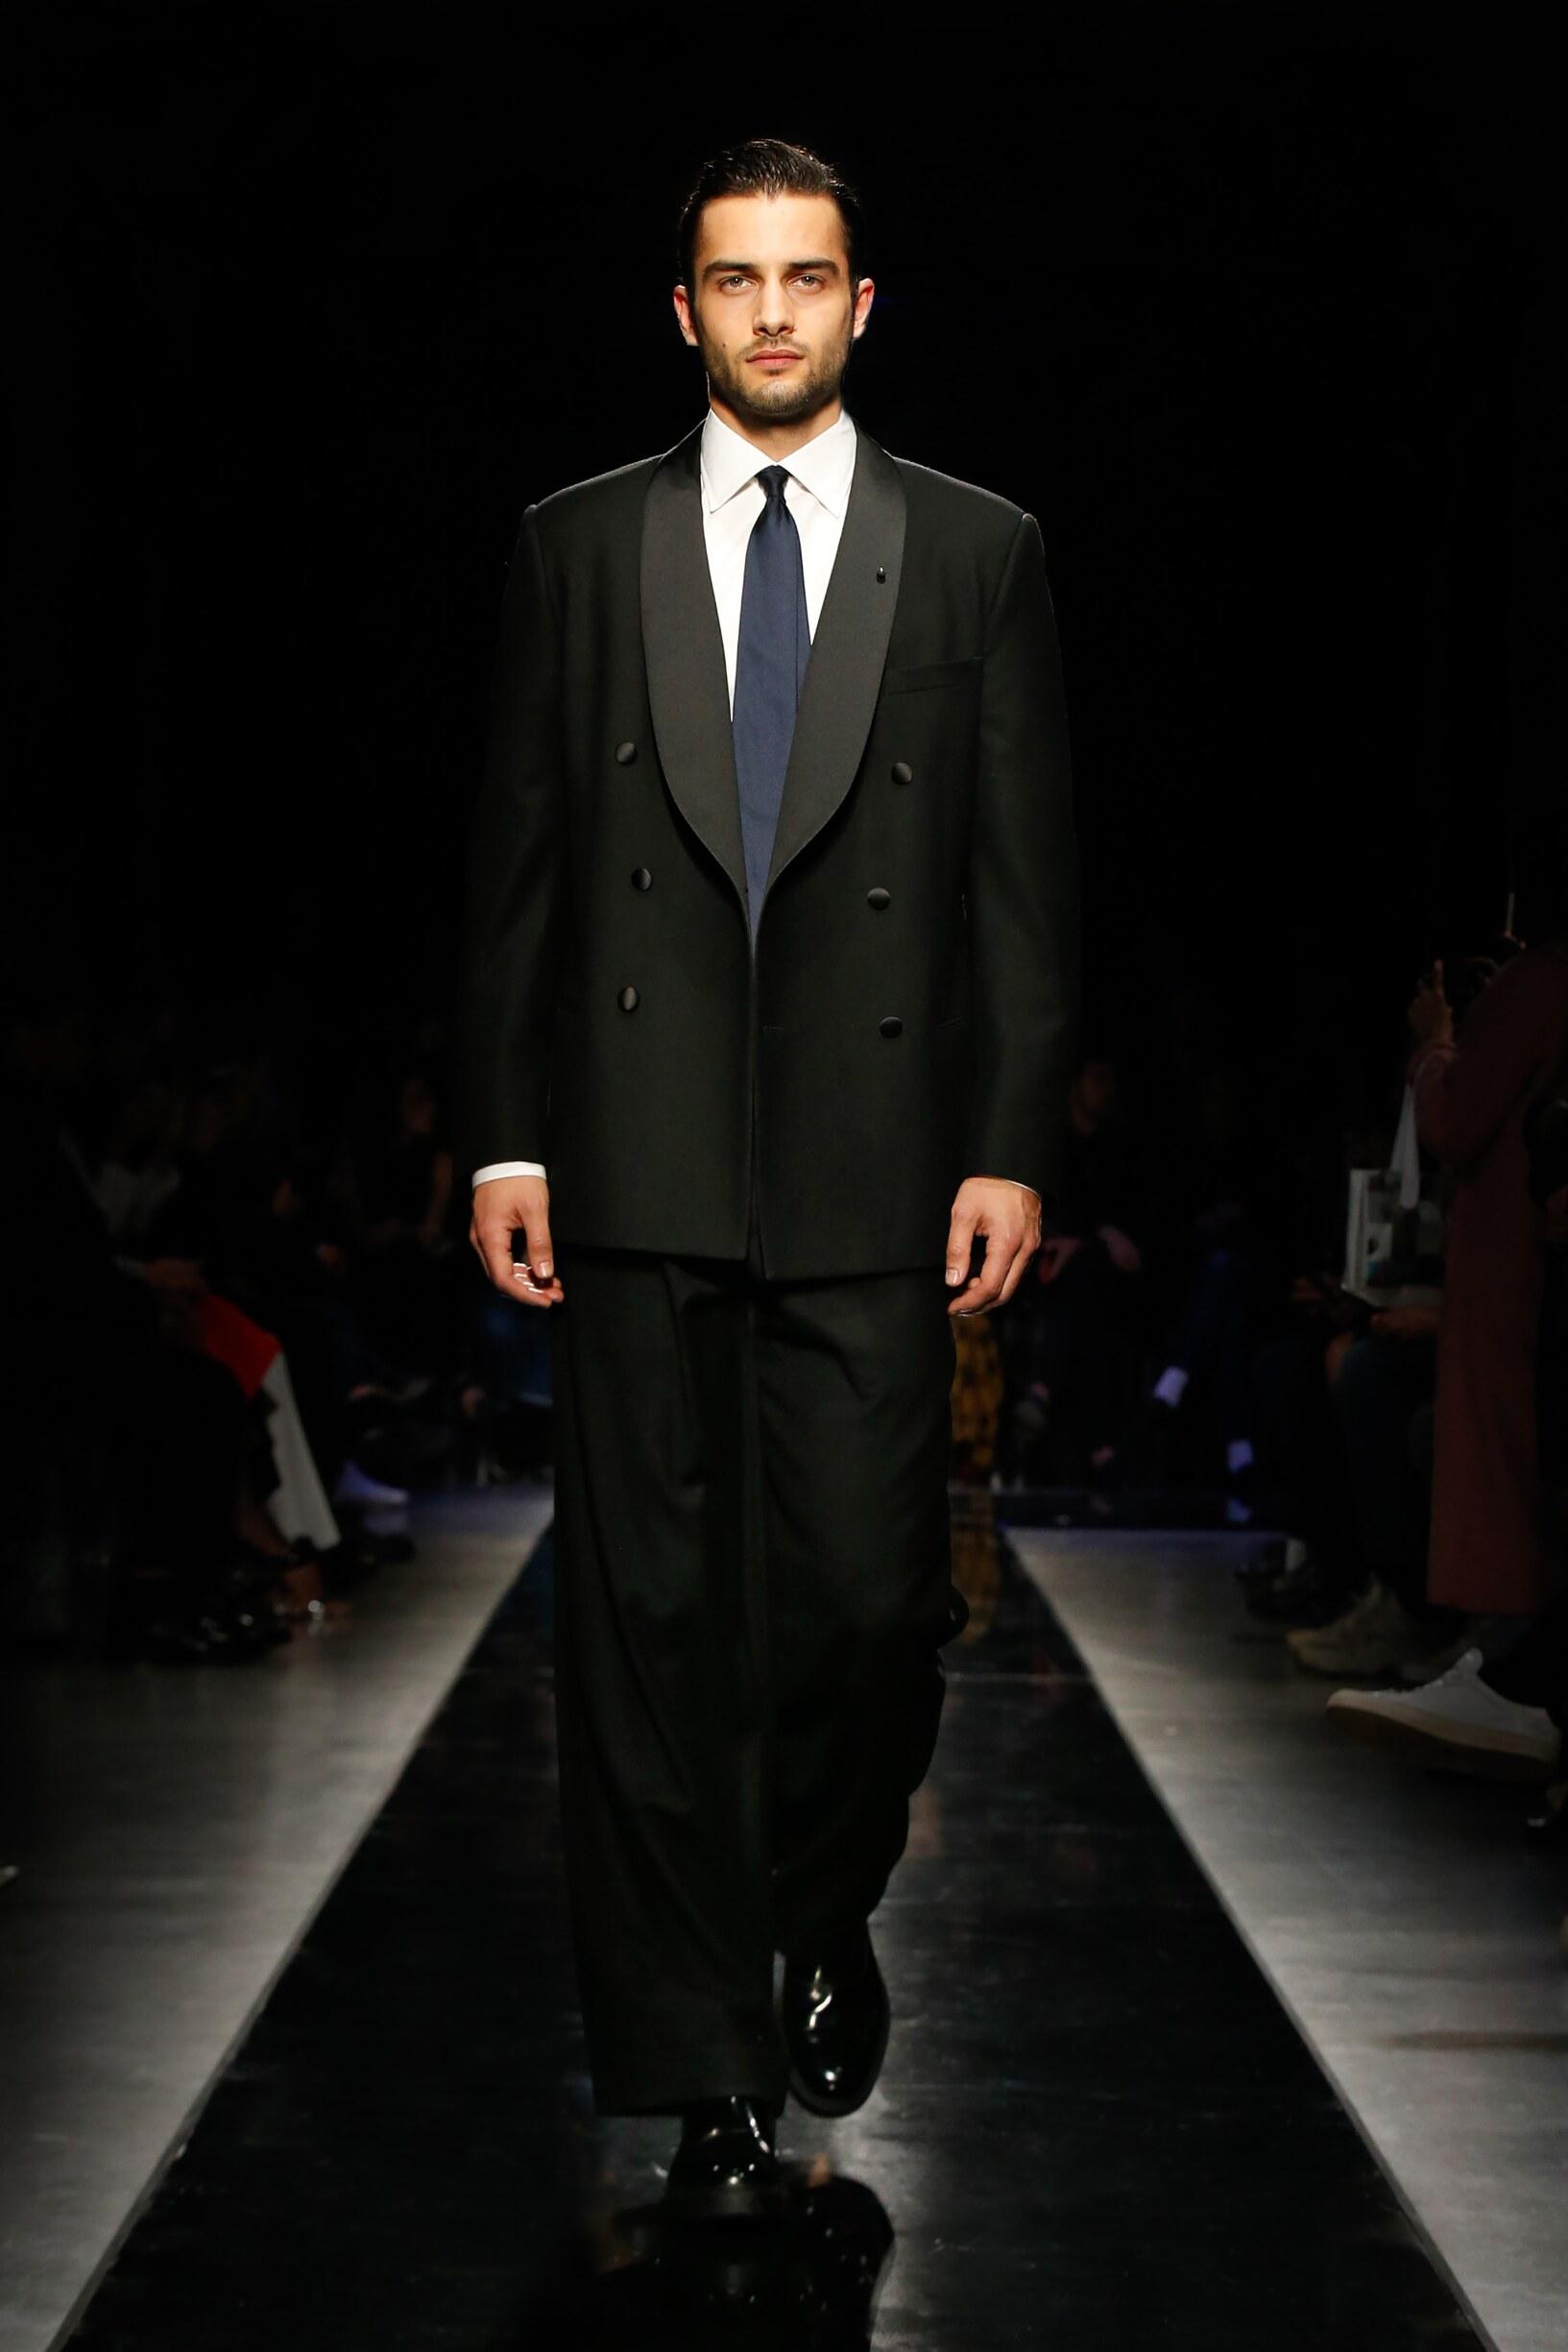 Giorgio Armani Fall Winter 2019 Men's Collection Milan Fashion Week